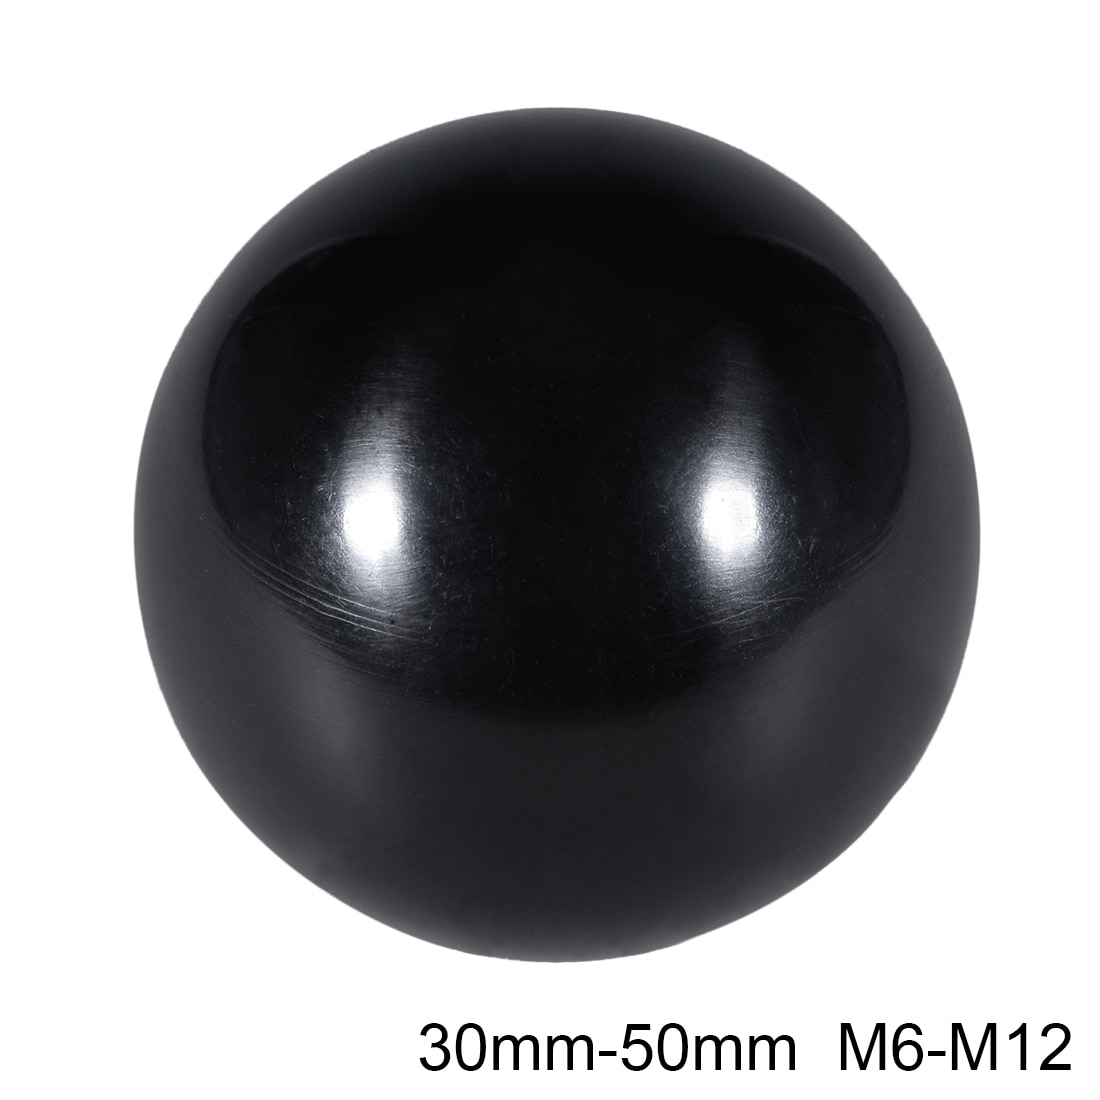 Uxcell 4 Uds Thermoset perilla de bola M8/M10/M12 manija de la máquina de hilo femenino 30/32/35/40/50mm de diámetro borde liso negro